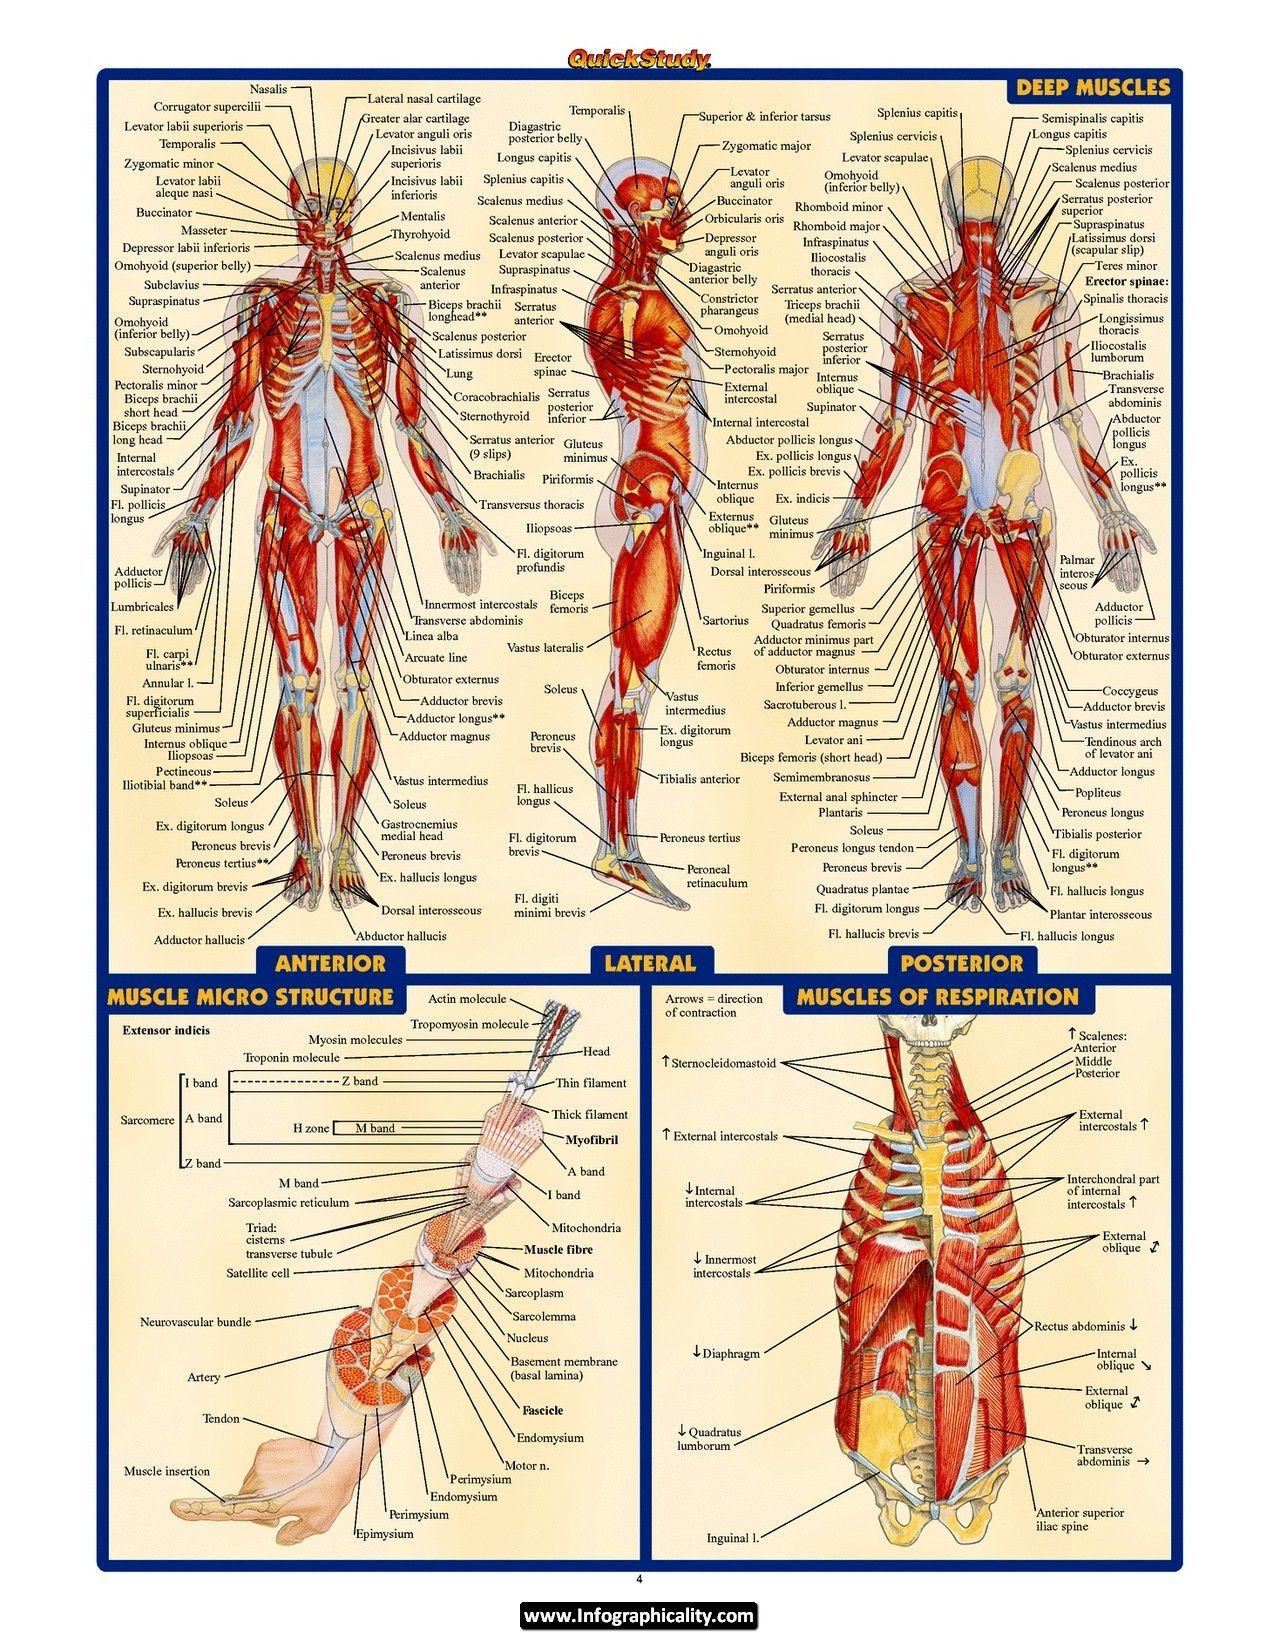 Pin By Anthony Polichetti On Body Stuff Pinterest Anatomy Human